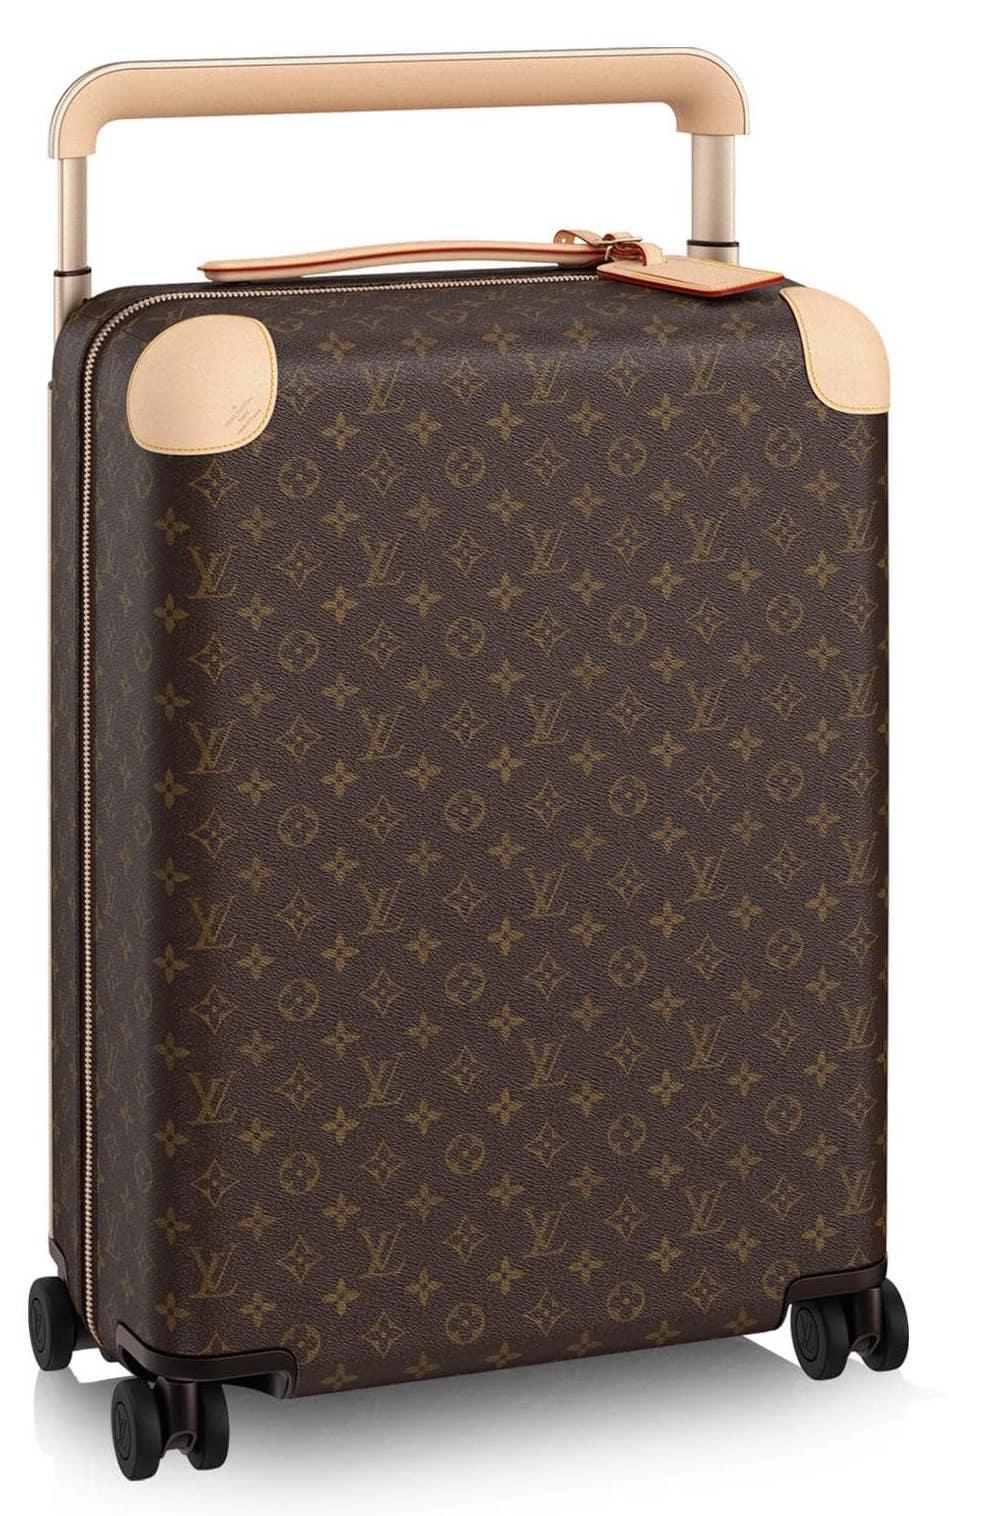 shop-top-desinger-suitcases-for-your-summer-vacation-louis-vuitton